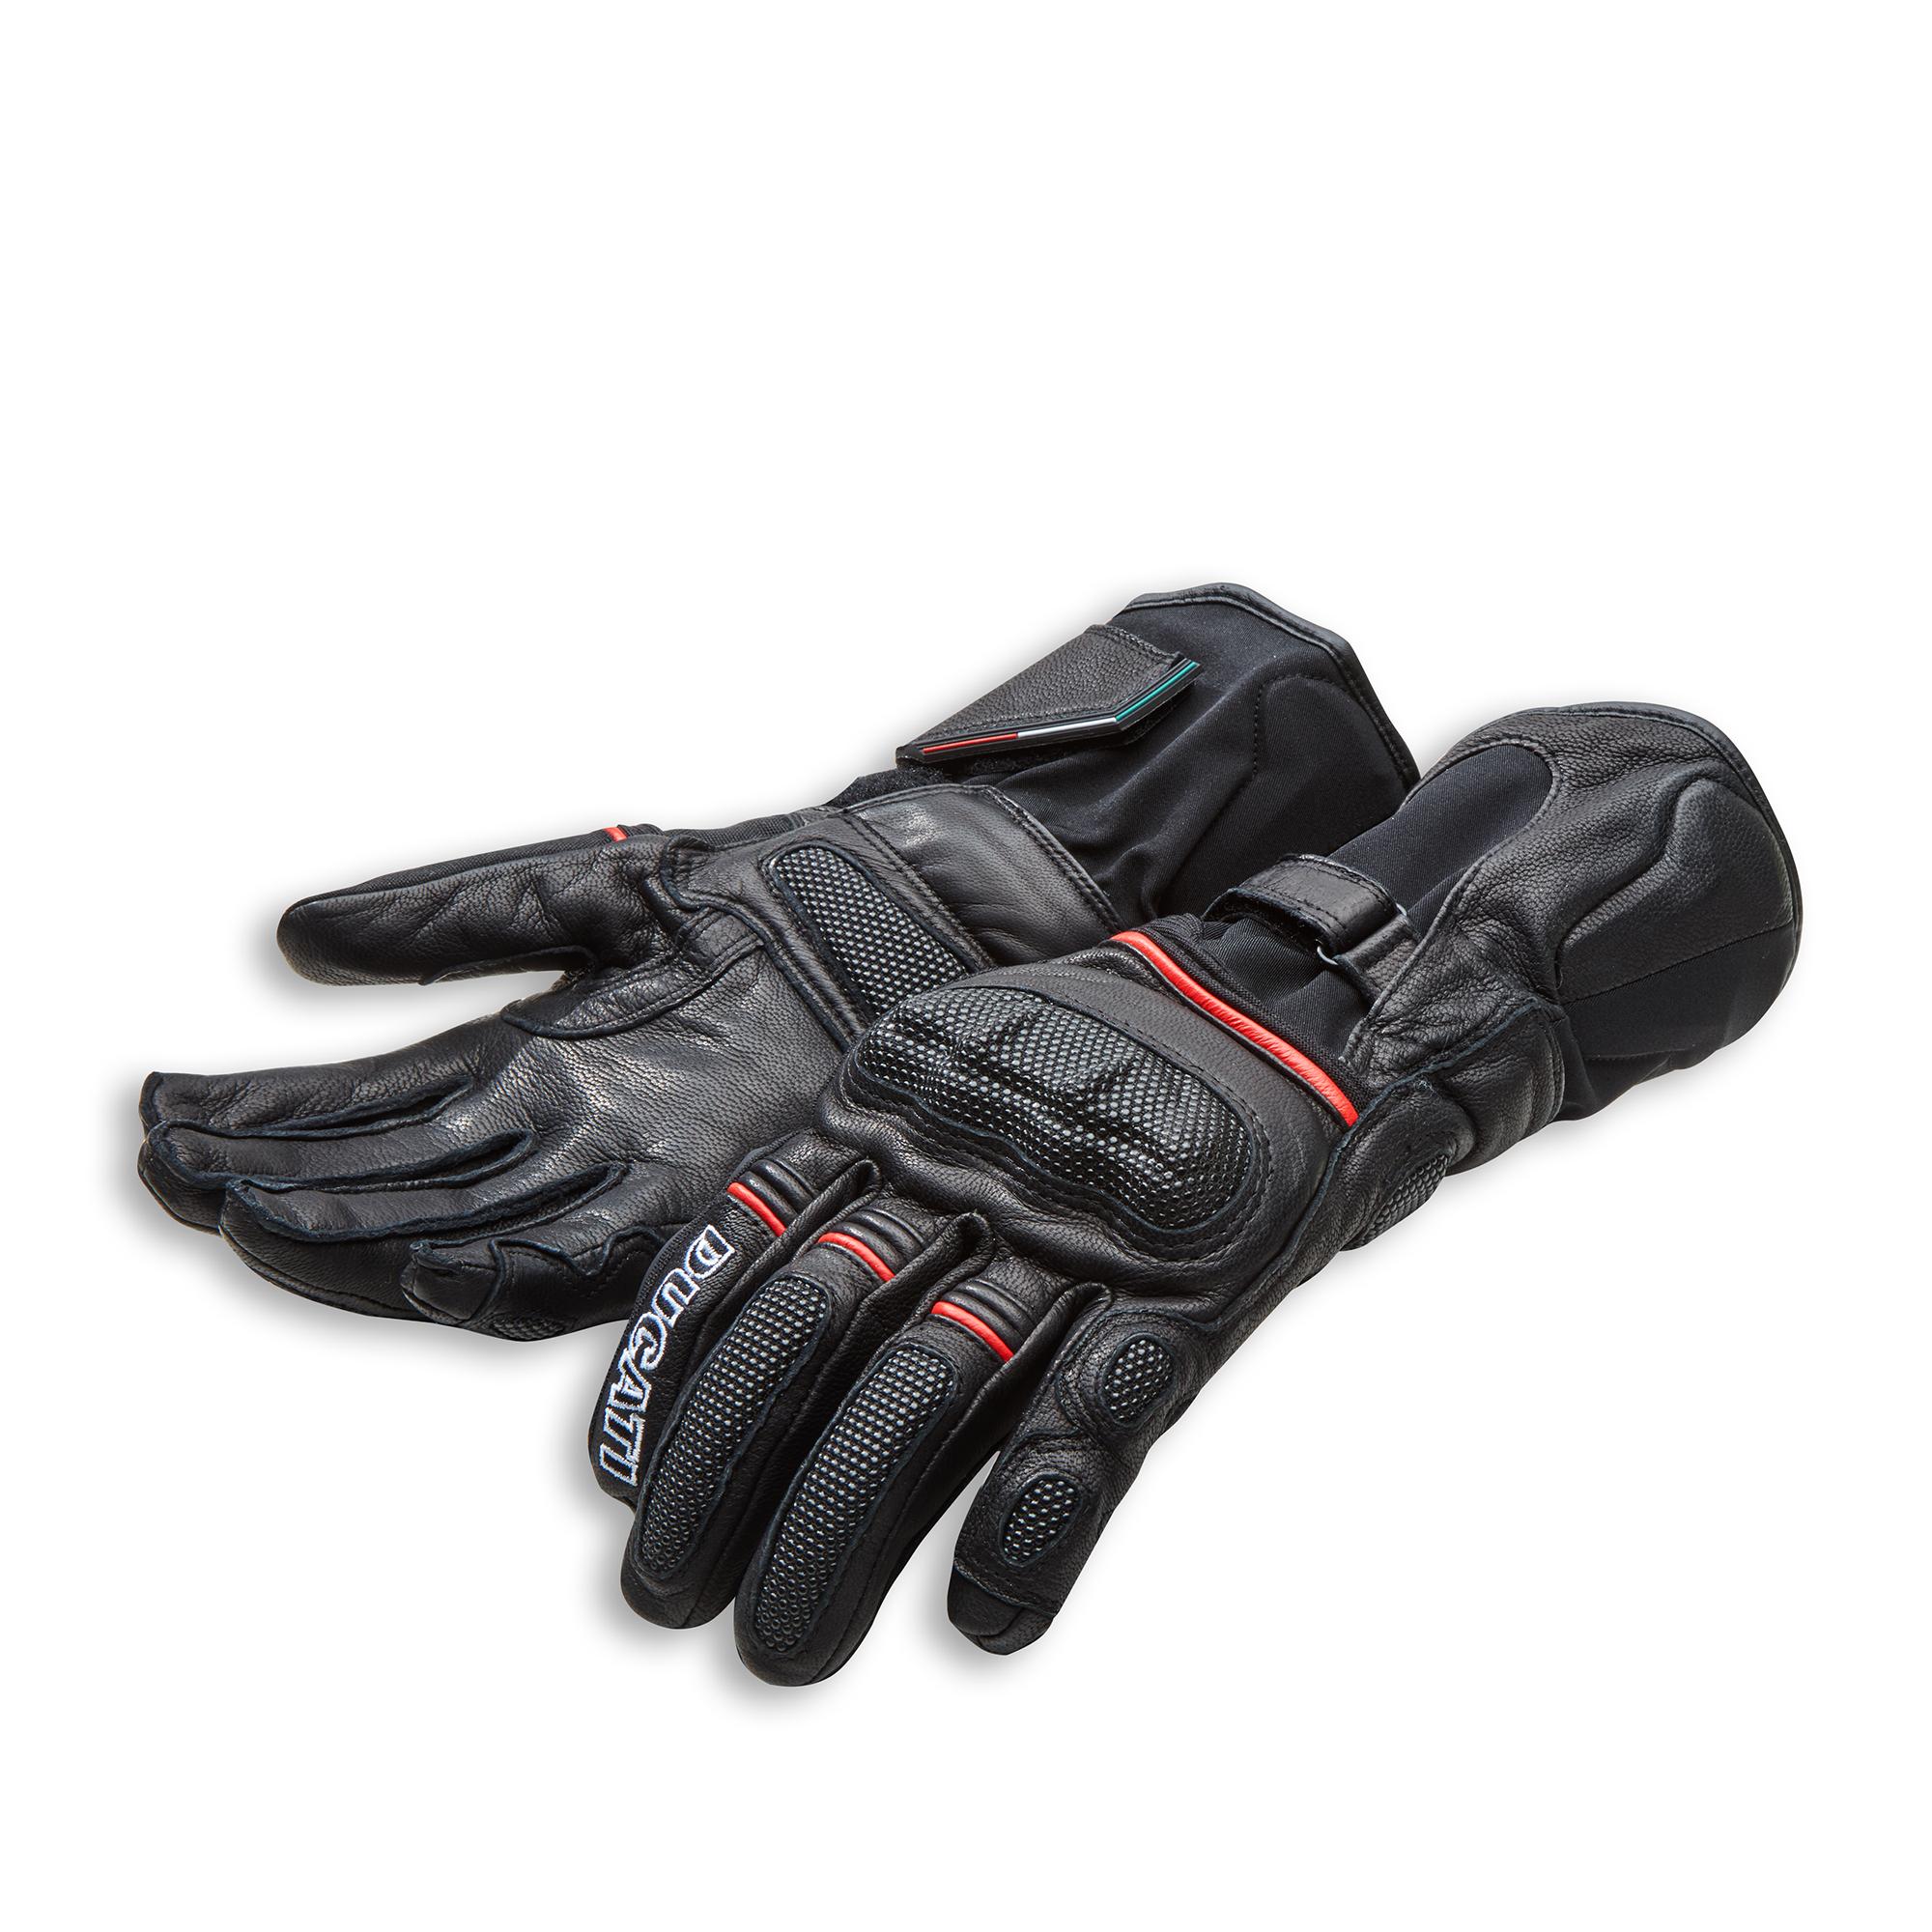 Strada C4 - Fabric-leather gloves 981040072